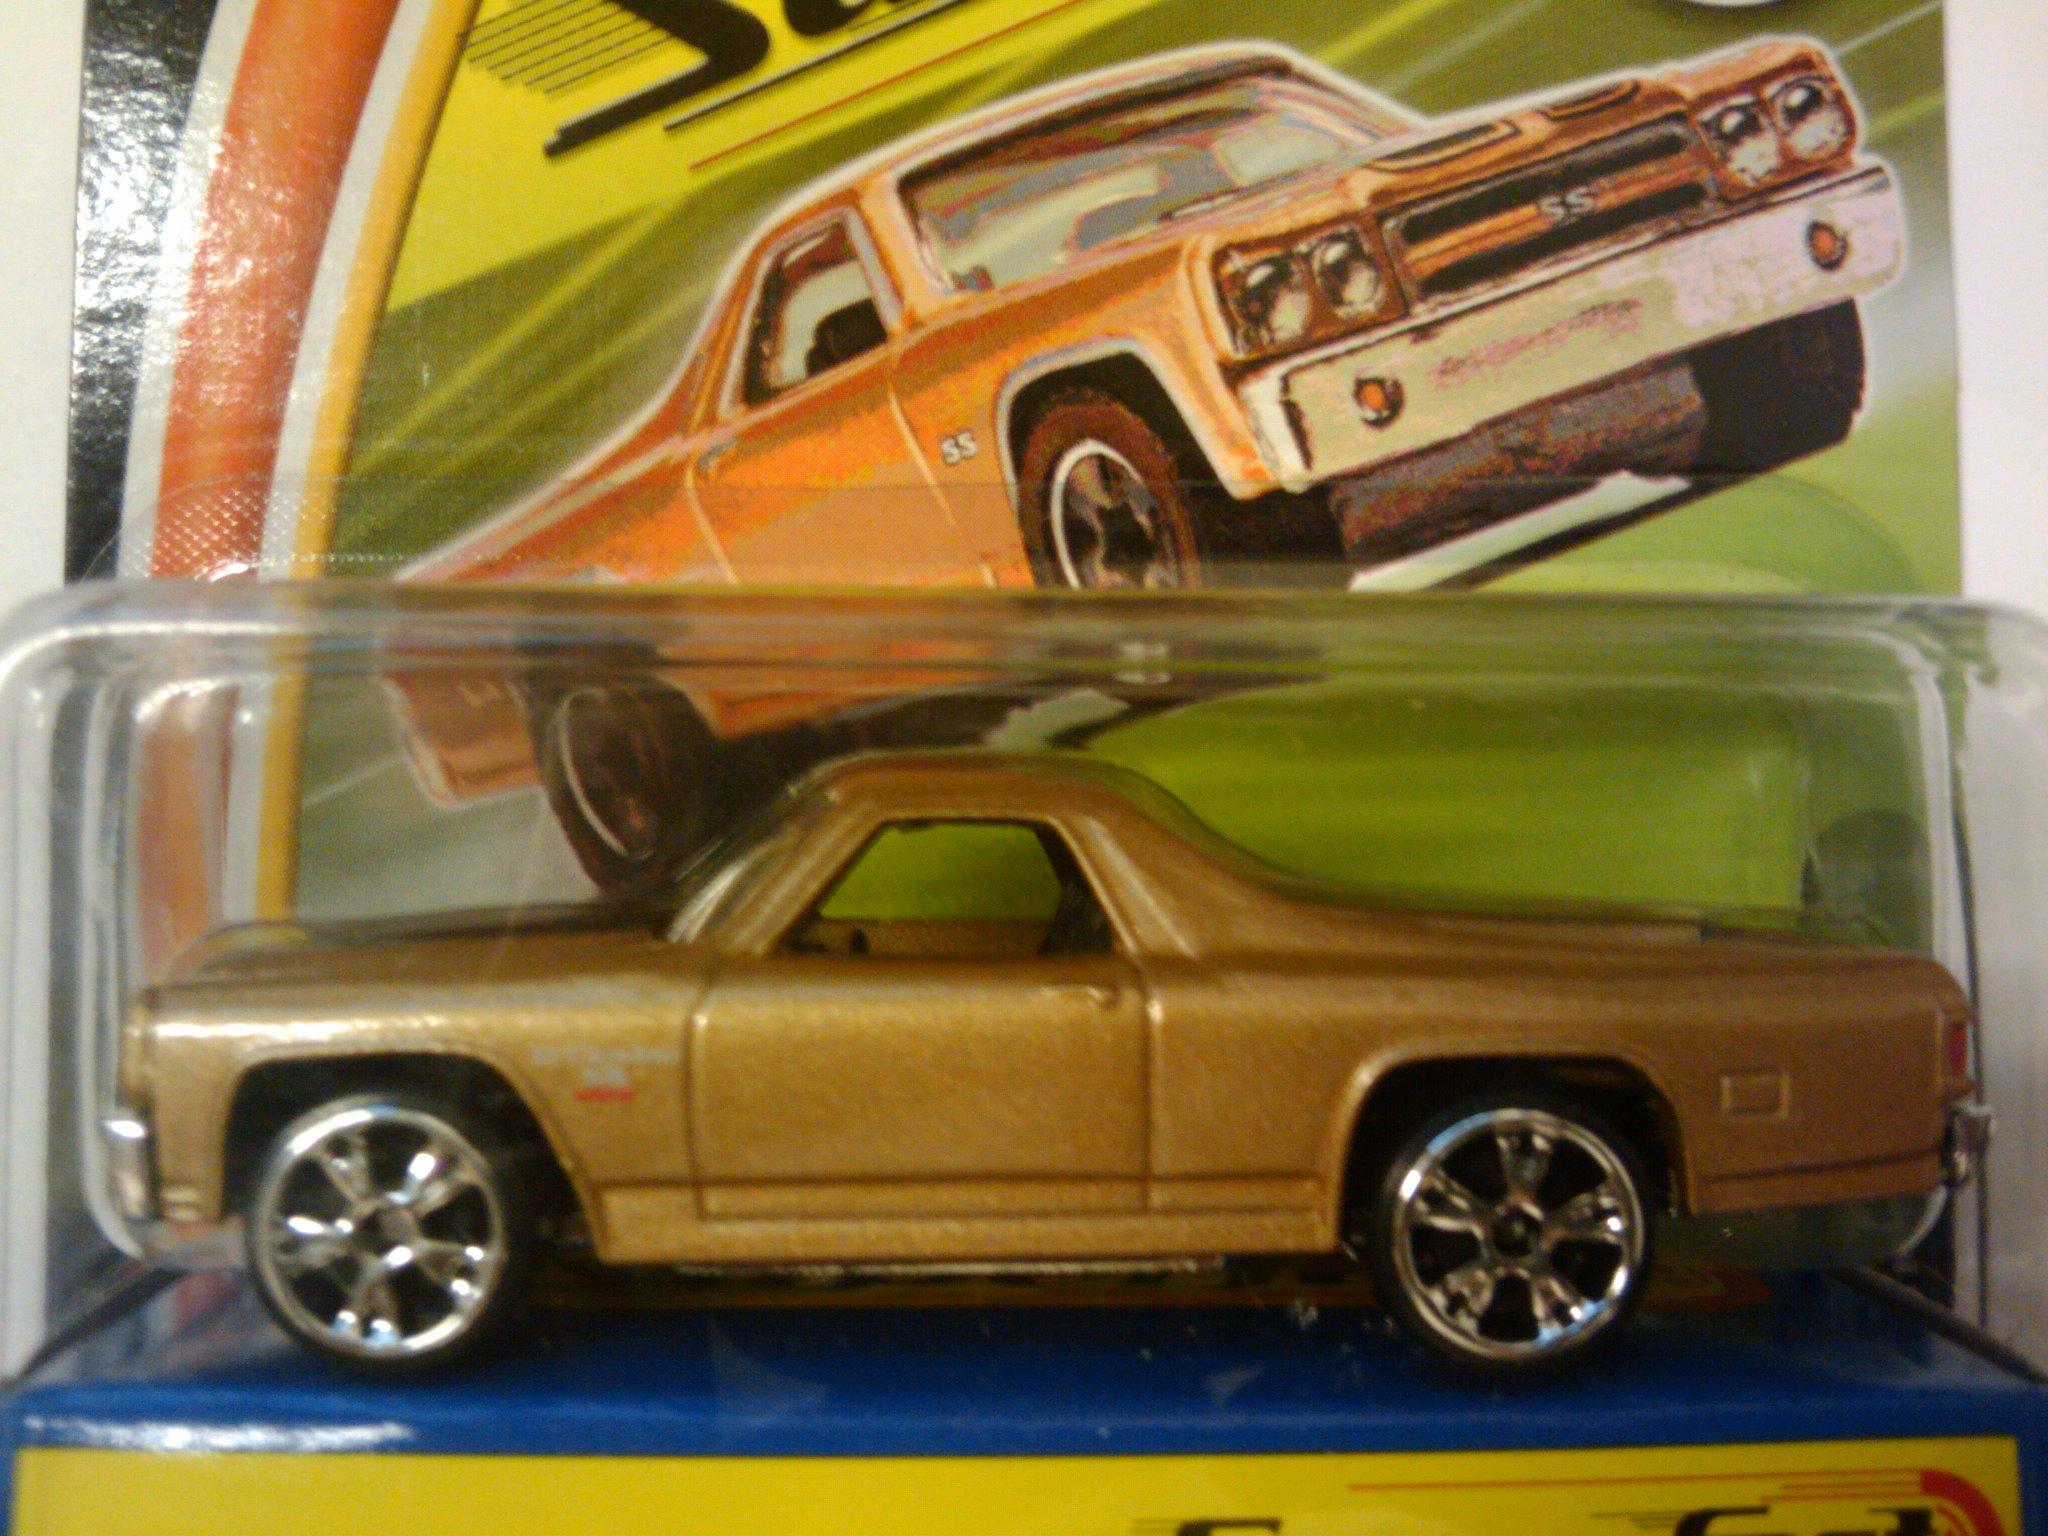 '70 Chevy El Camino - Matchbox